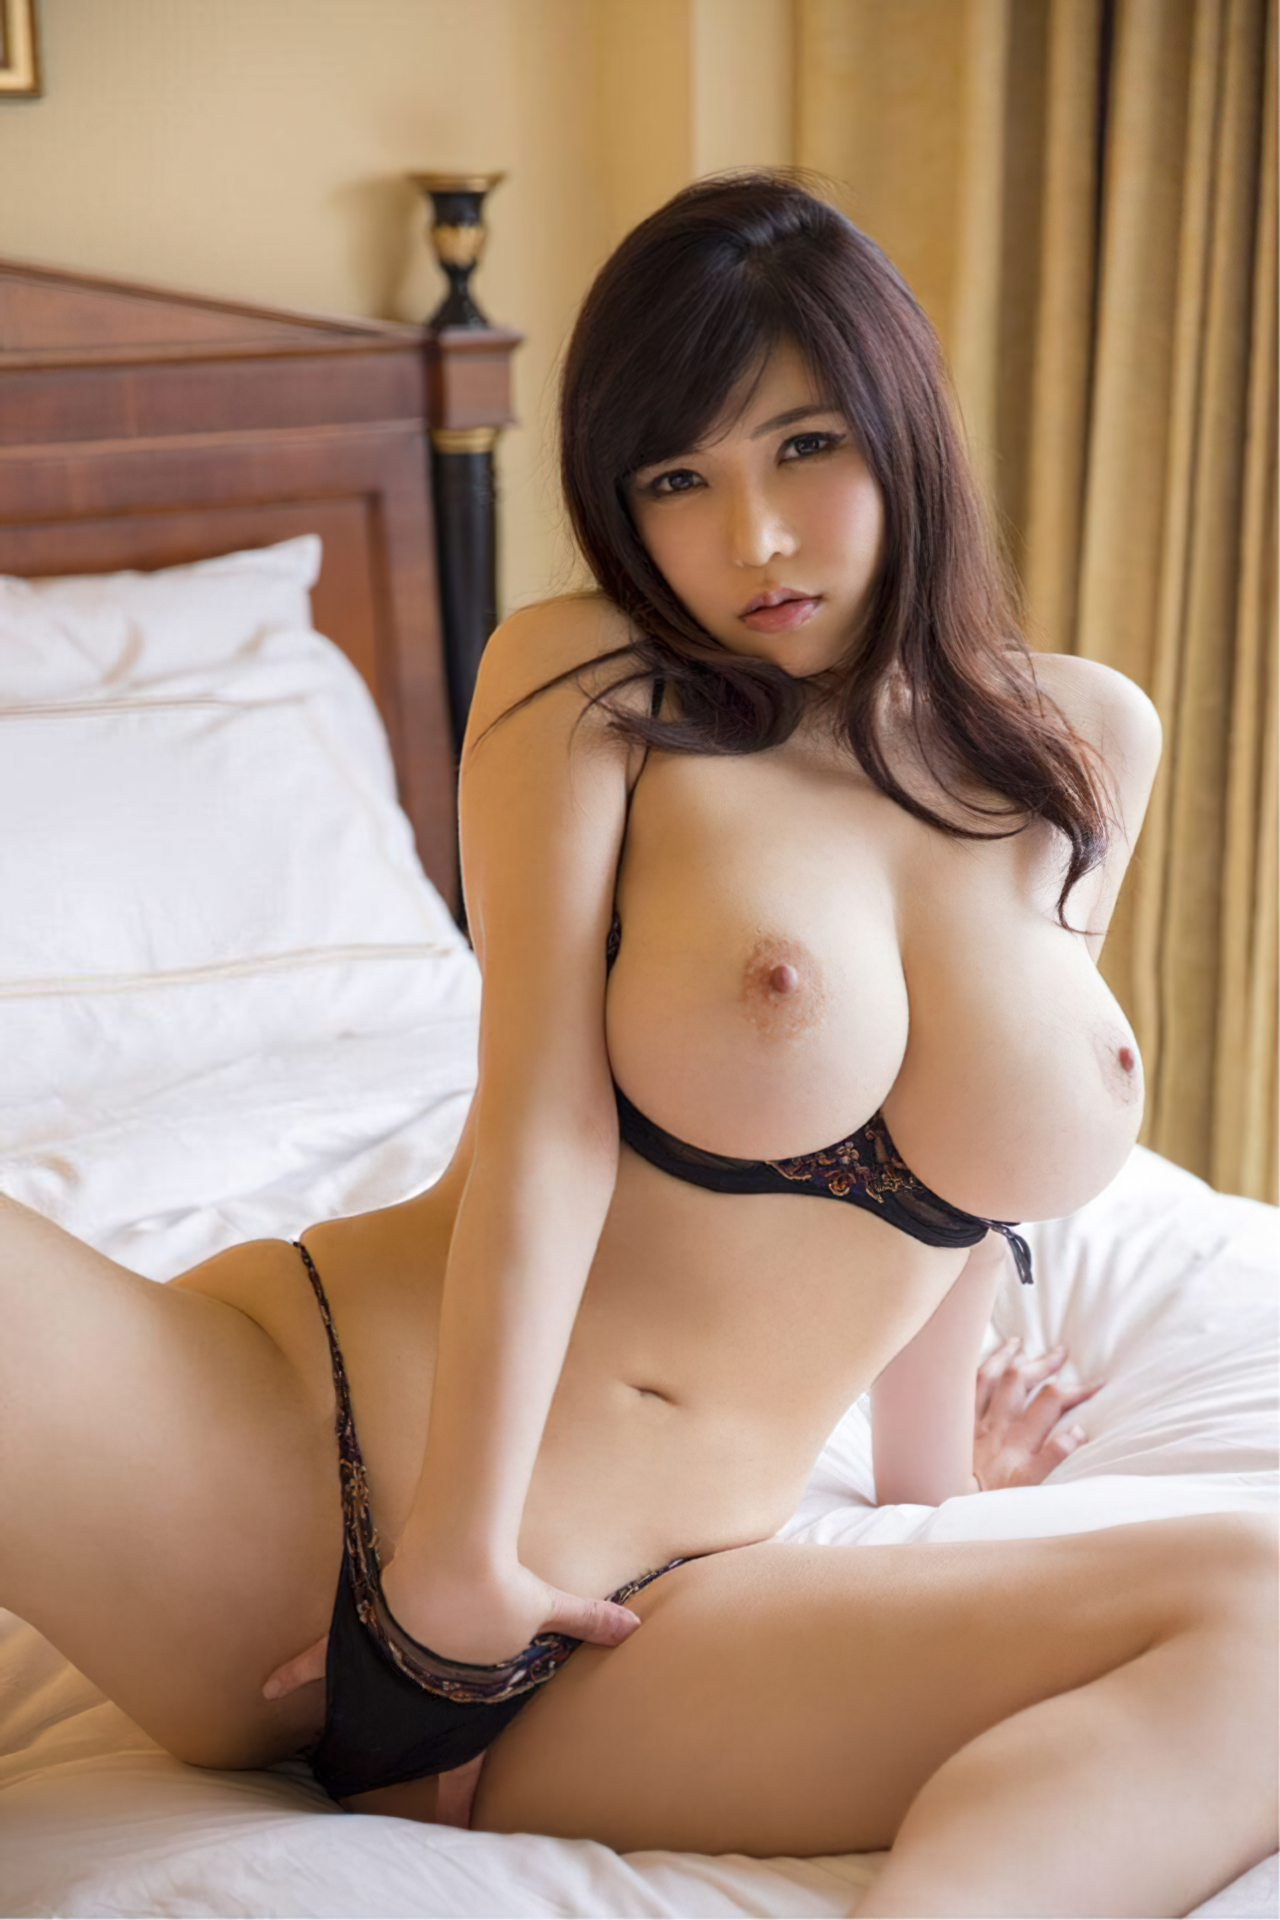 Japonesa Sensual na Cama